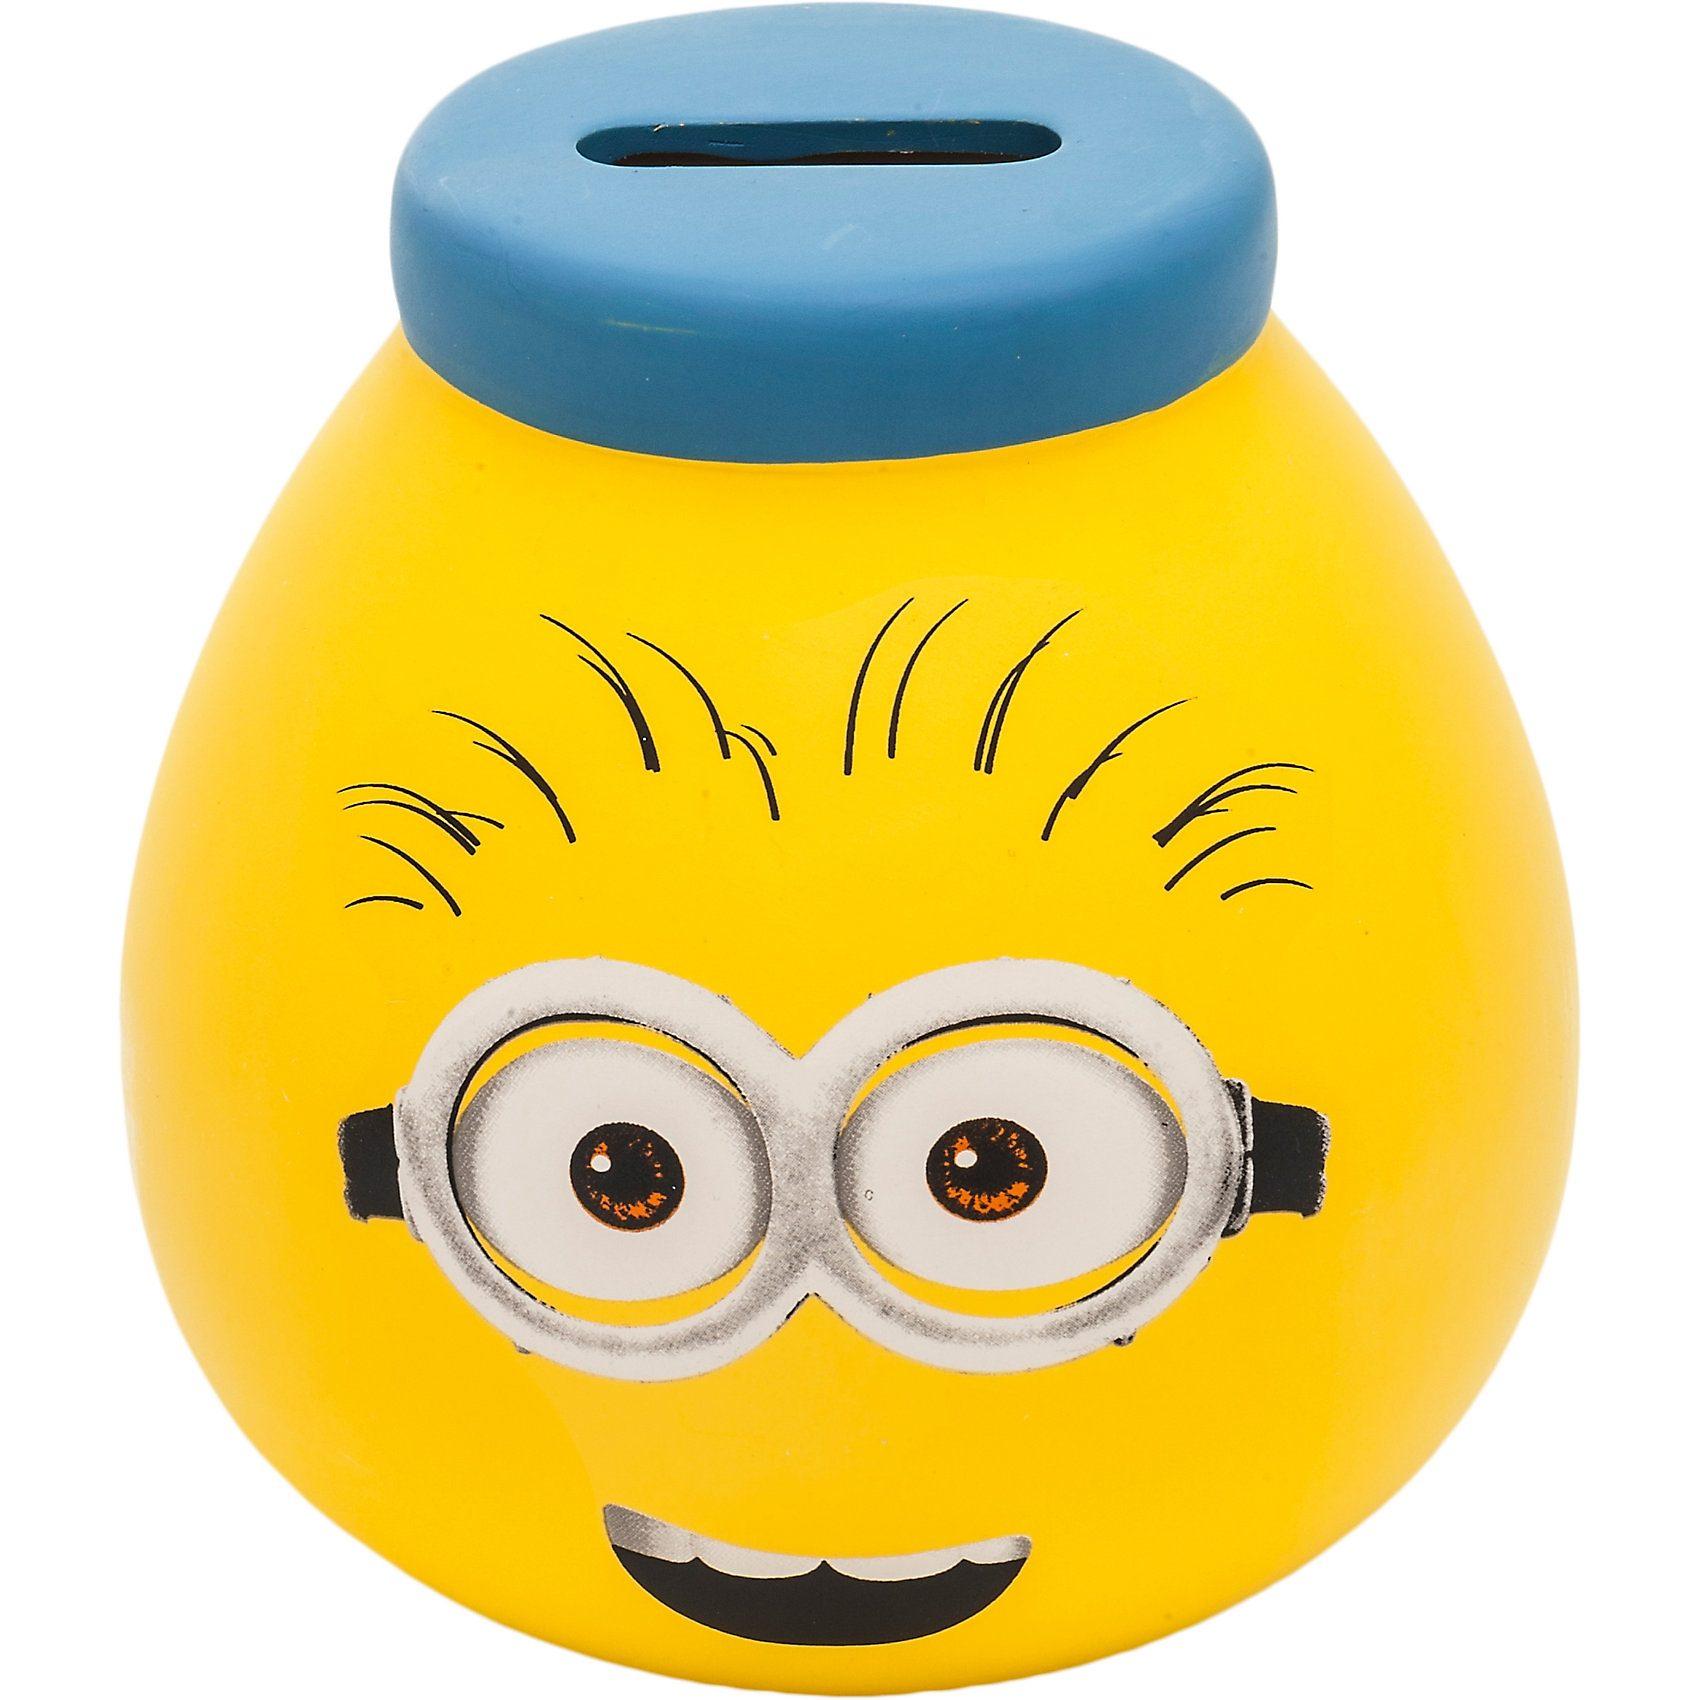 Joy Toy Spardose Minions, Keramik